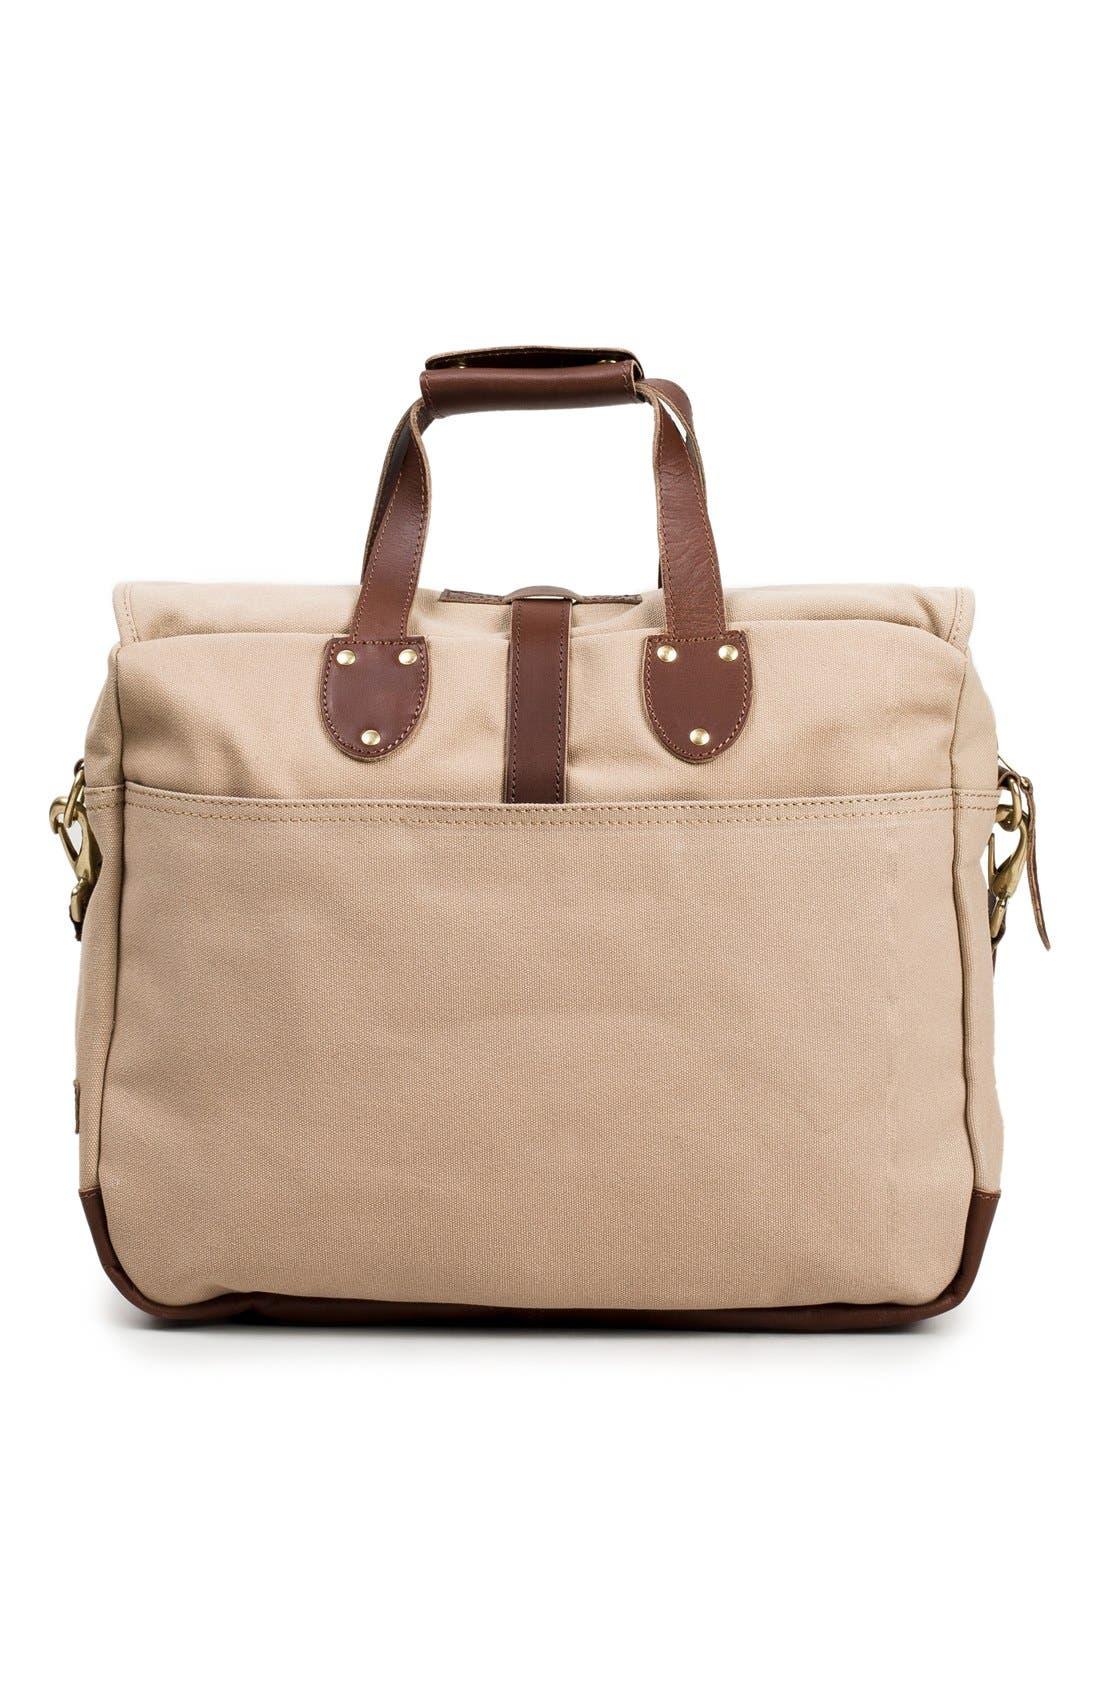 'Lakeland' Laptop Bag,                             Alternate thumbnail 3, color,                             Tan